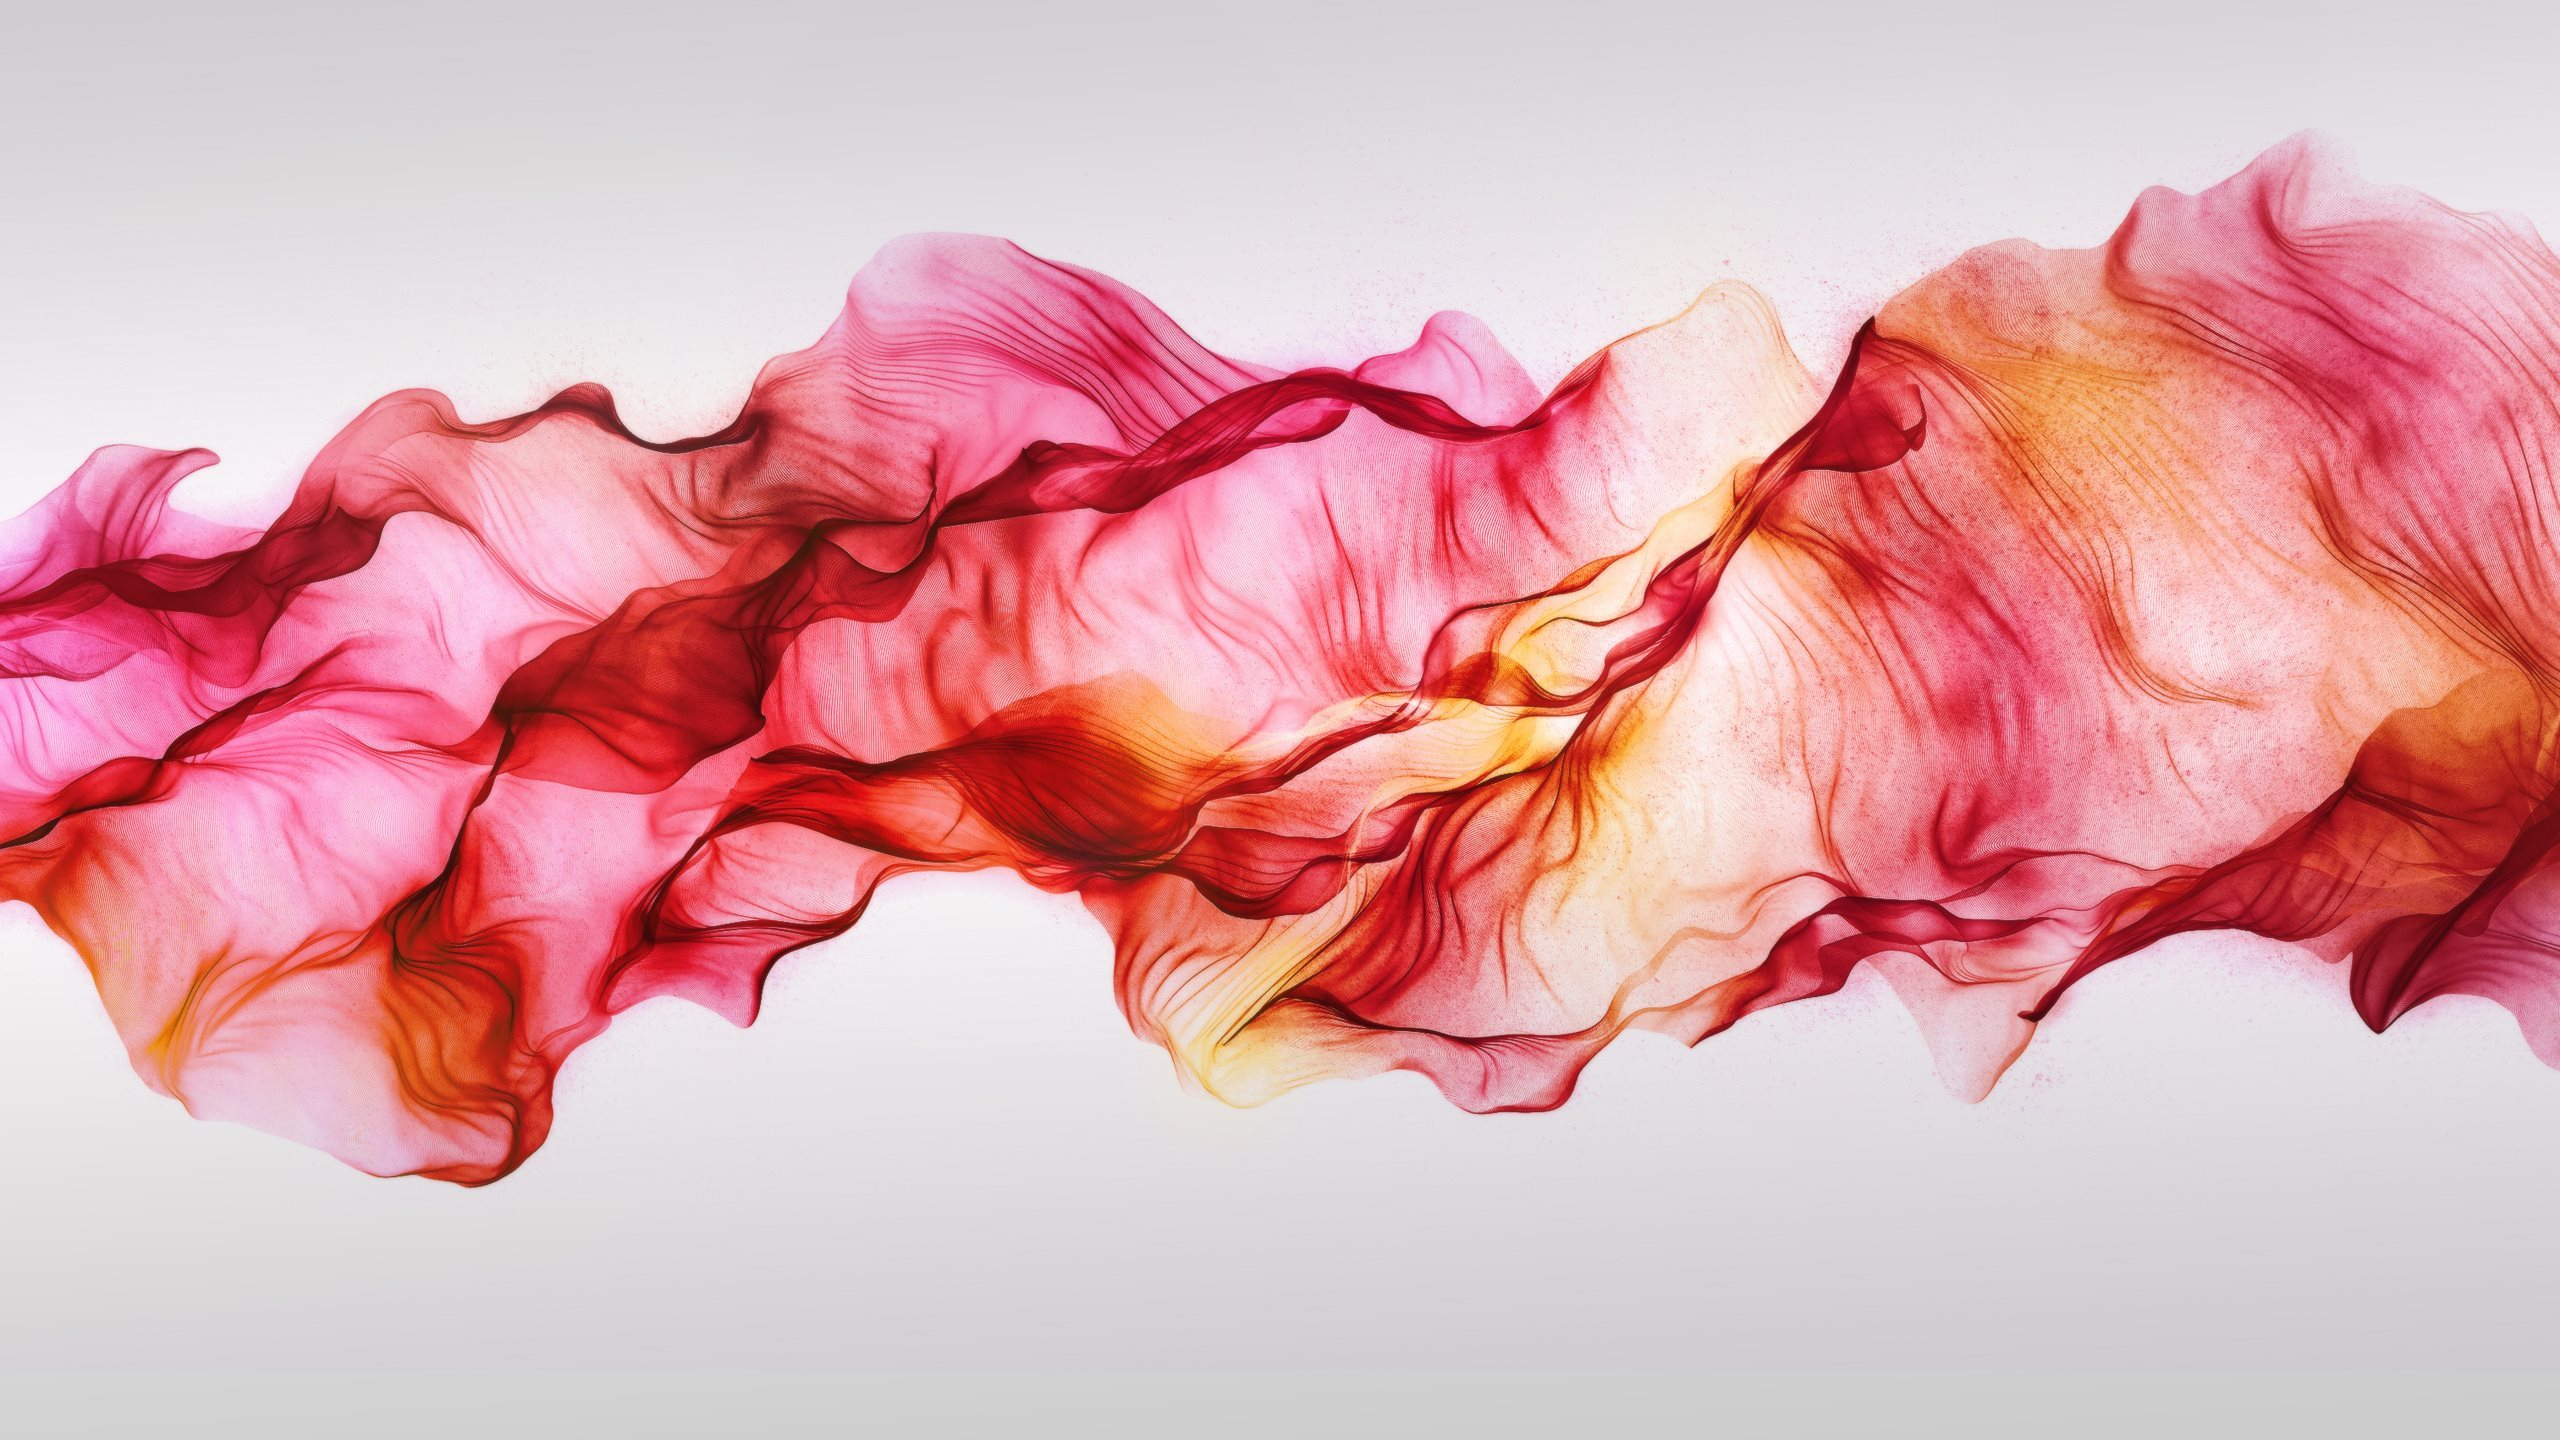 Red Smoke Wallpaper